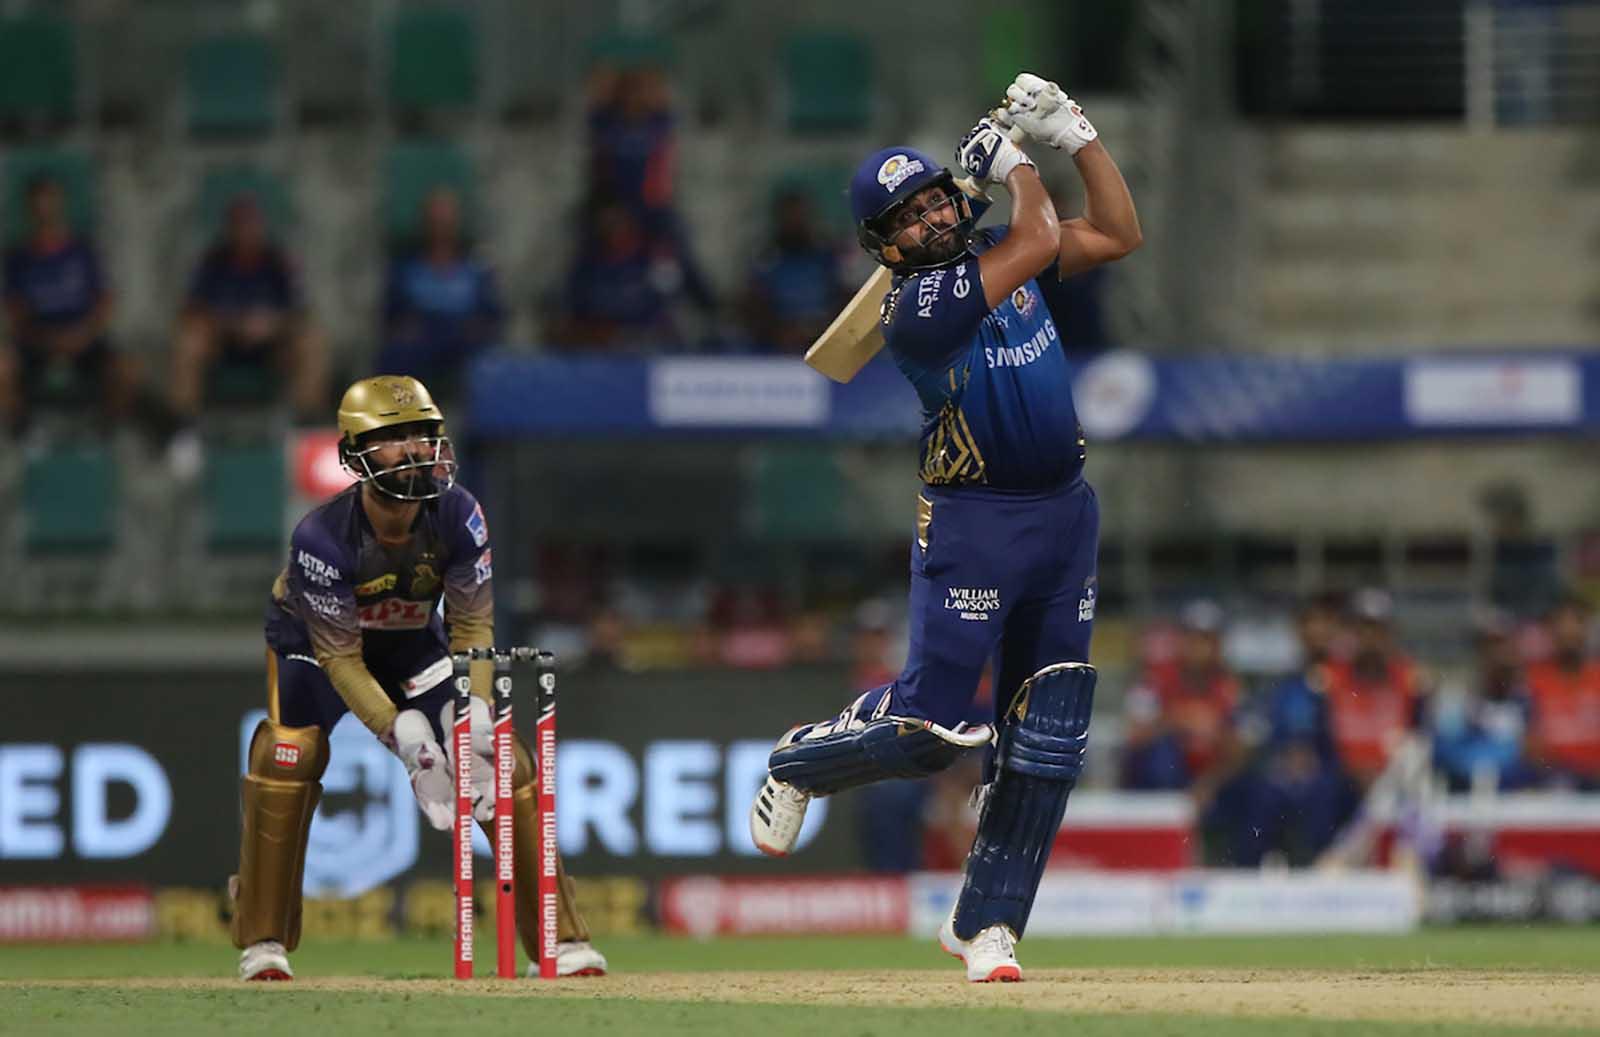 Rohit Sharma shines as Mumbai Indians wins it over KKR by 49 runs